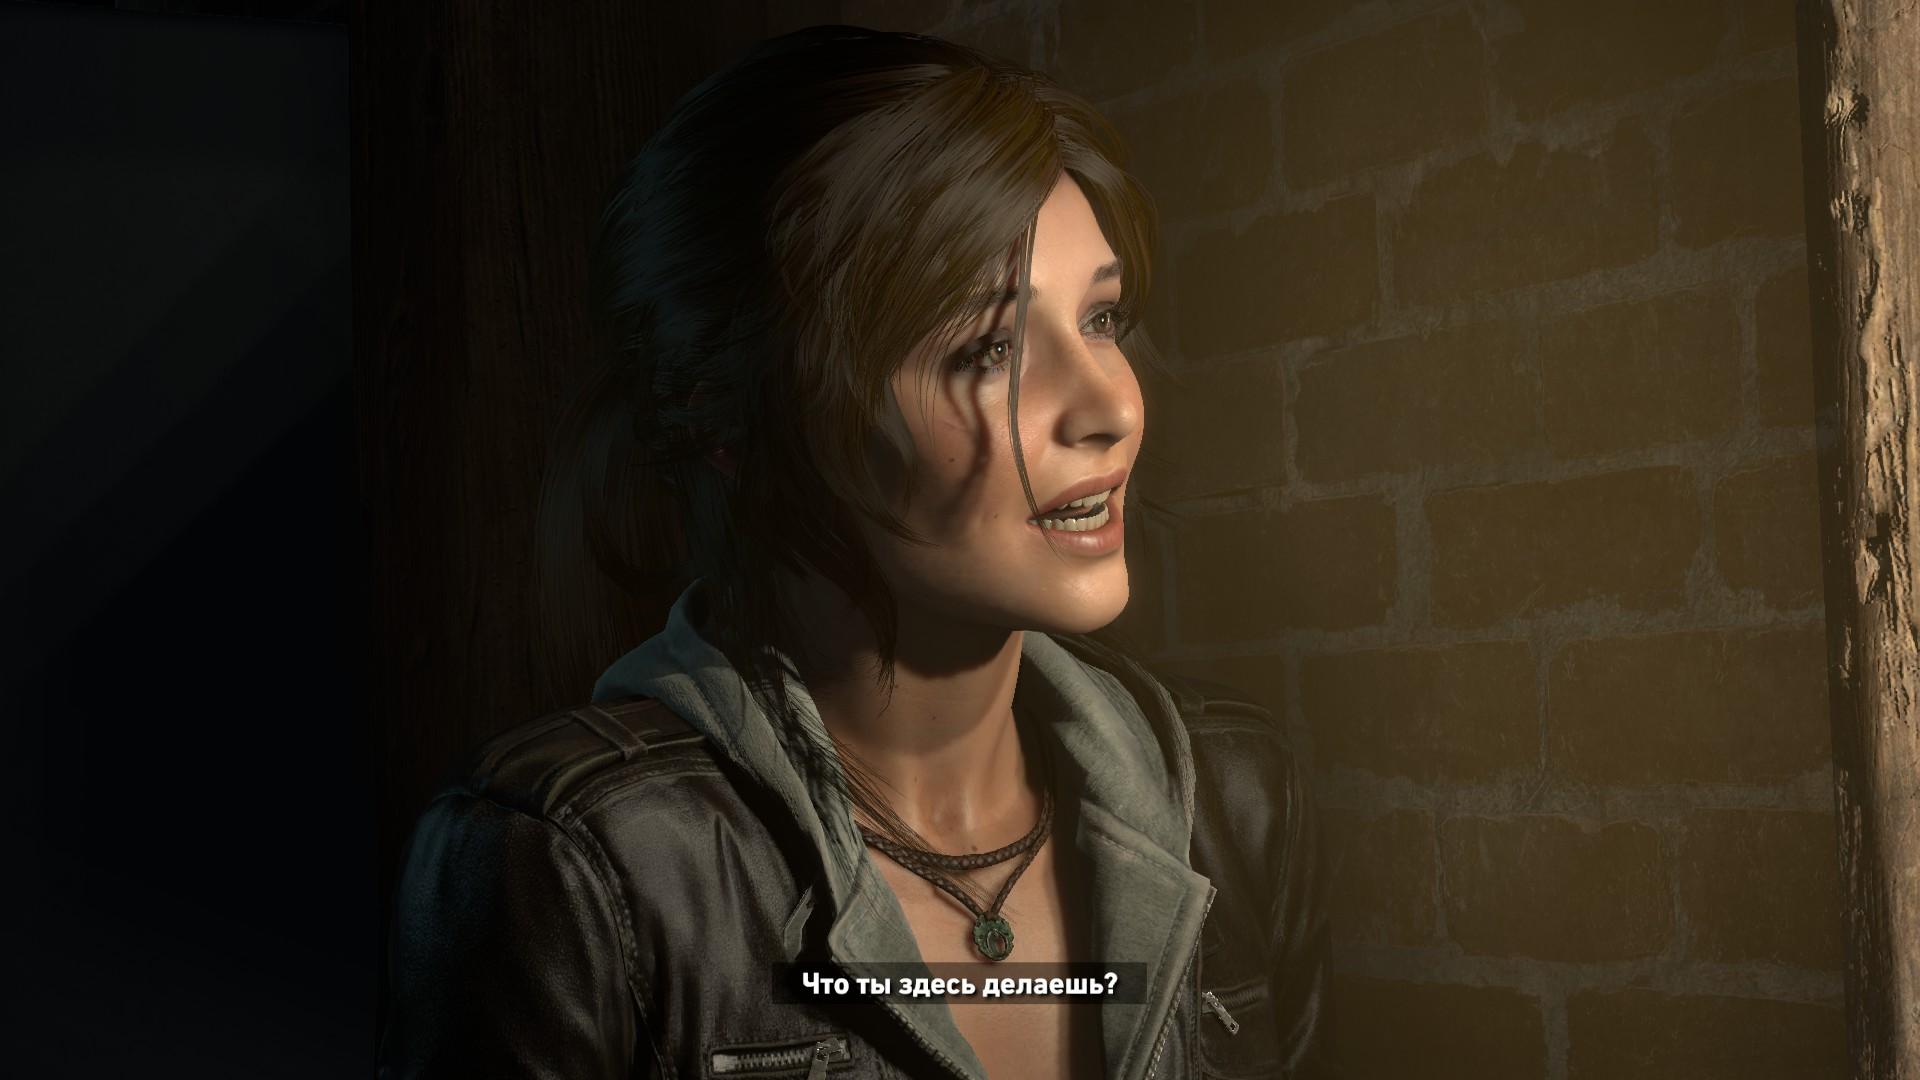 20171203195851_1.jpg - Rise of the Tomb Raider